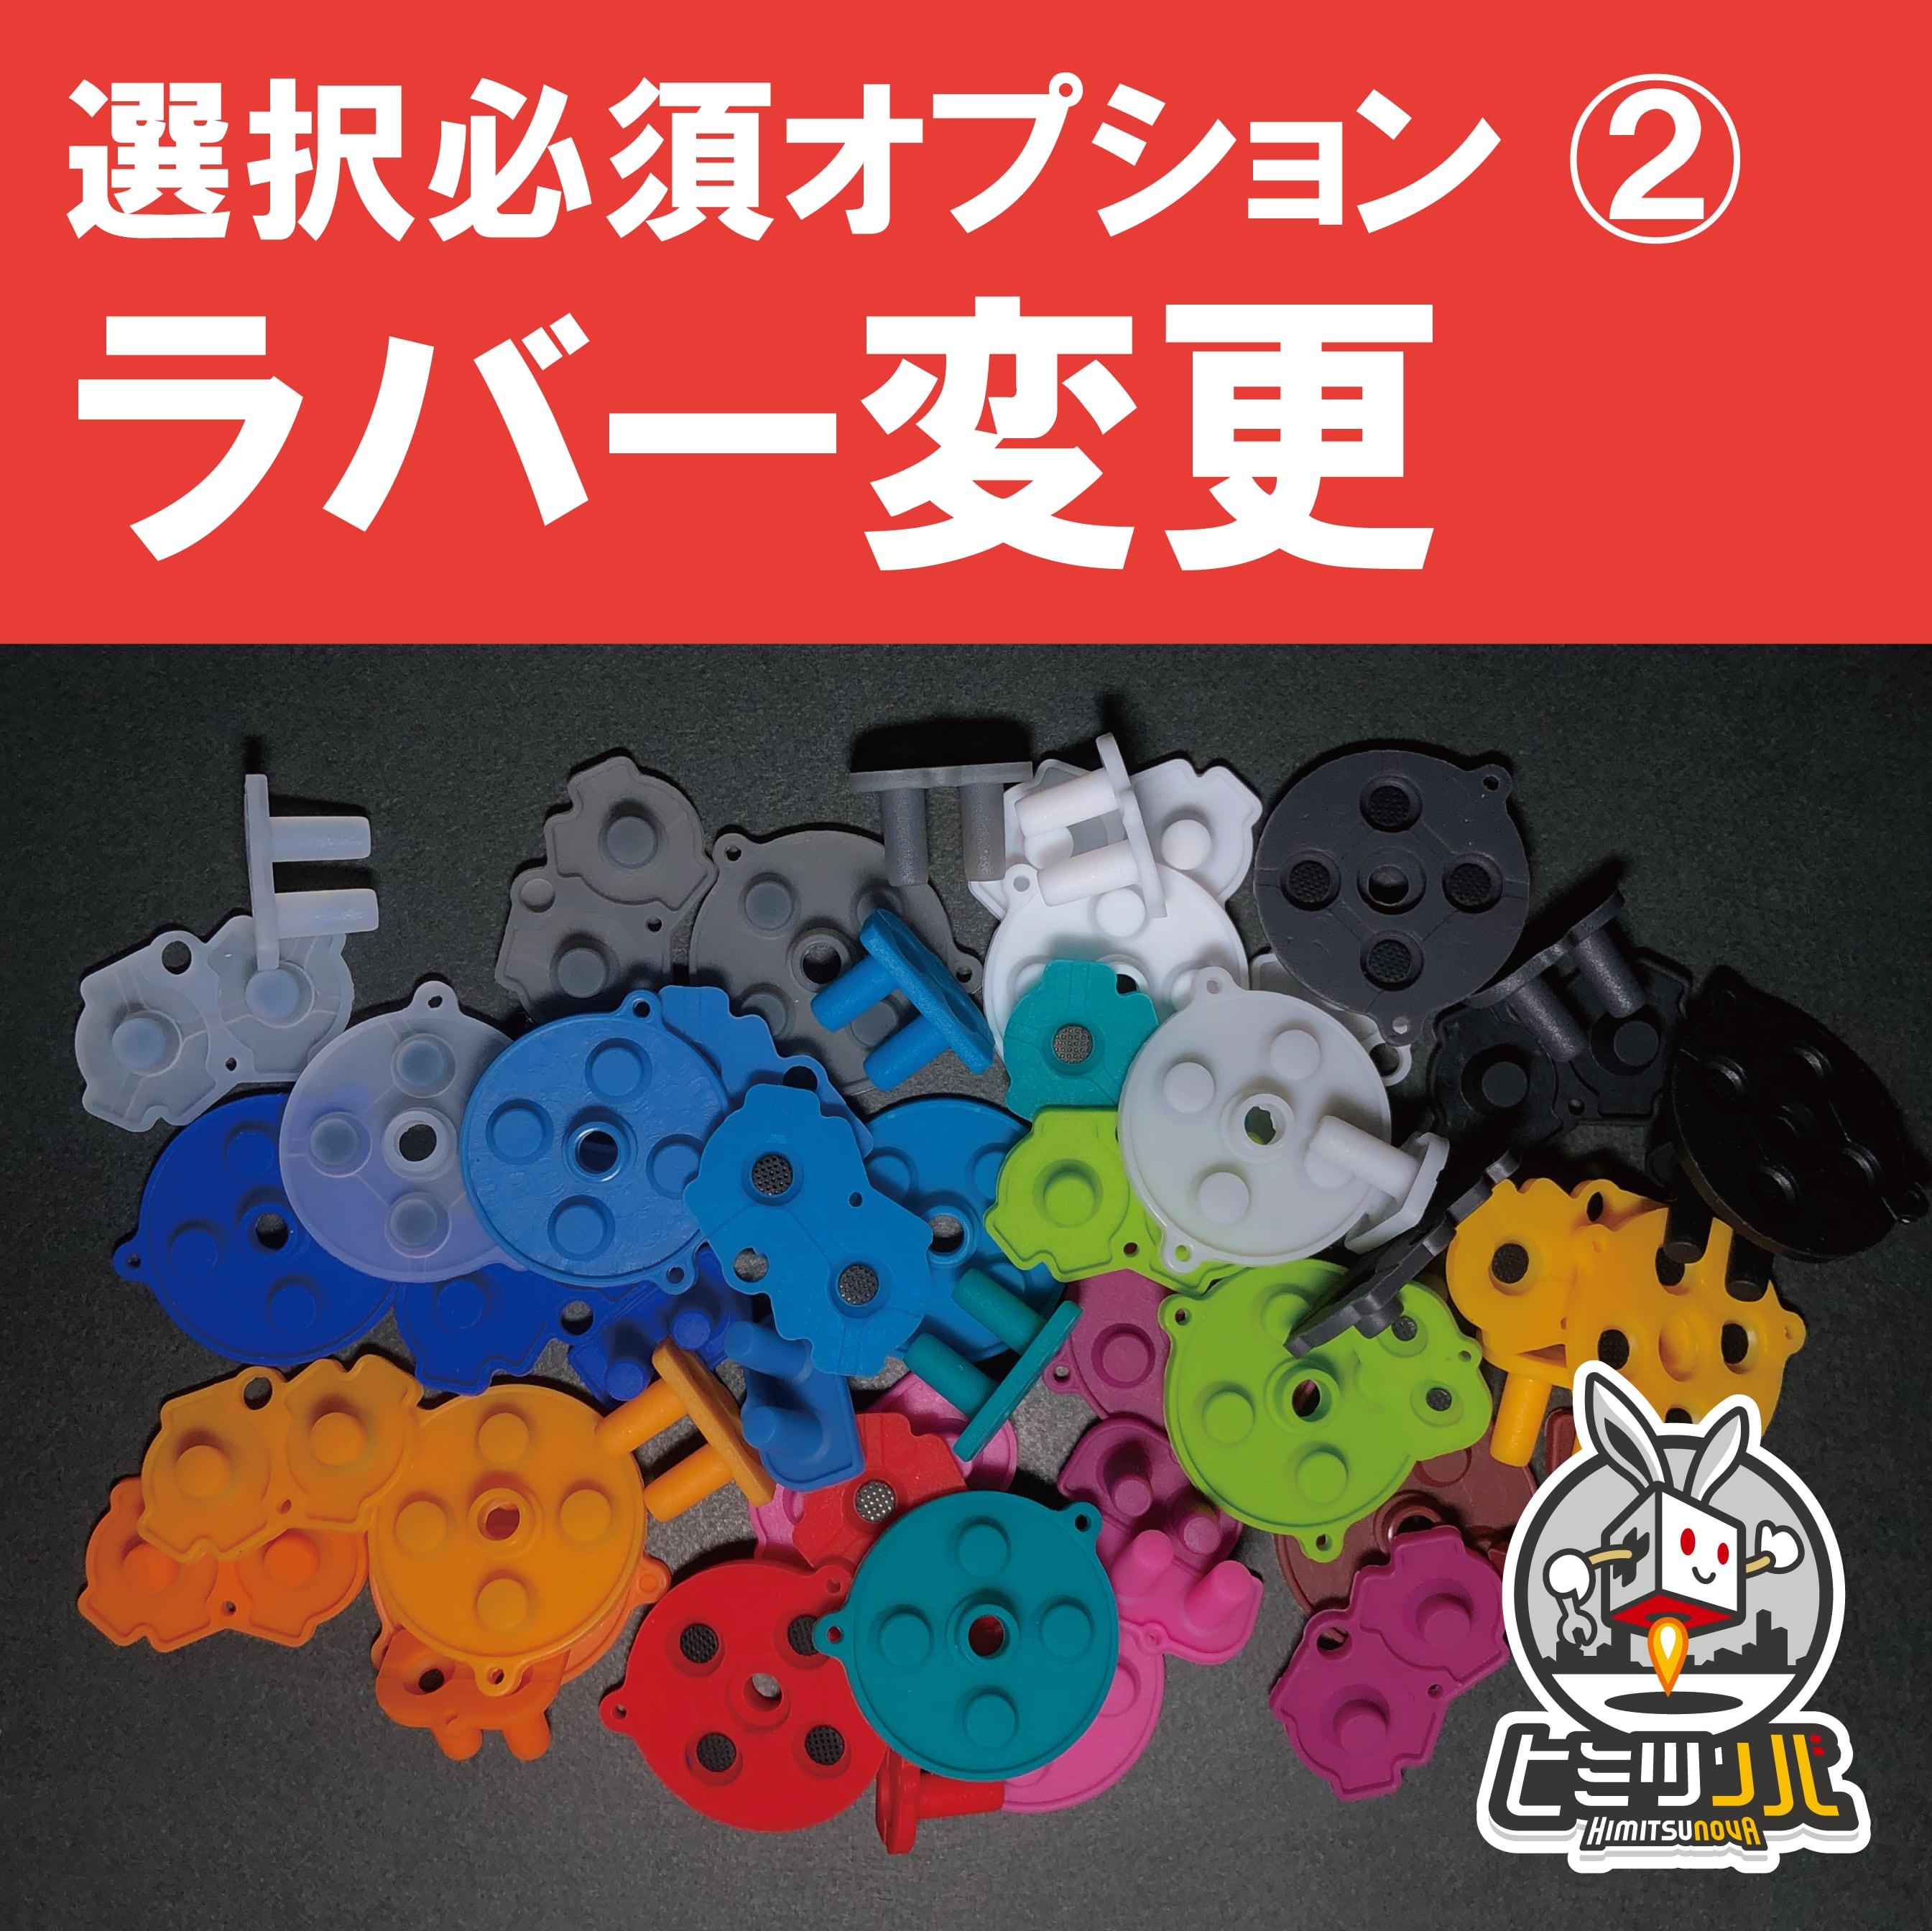 GBA カスタムオーダー専用オプション【ラバーパッド】